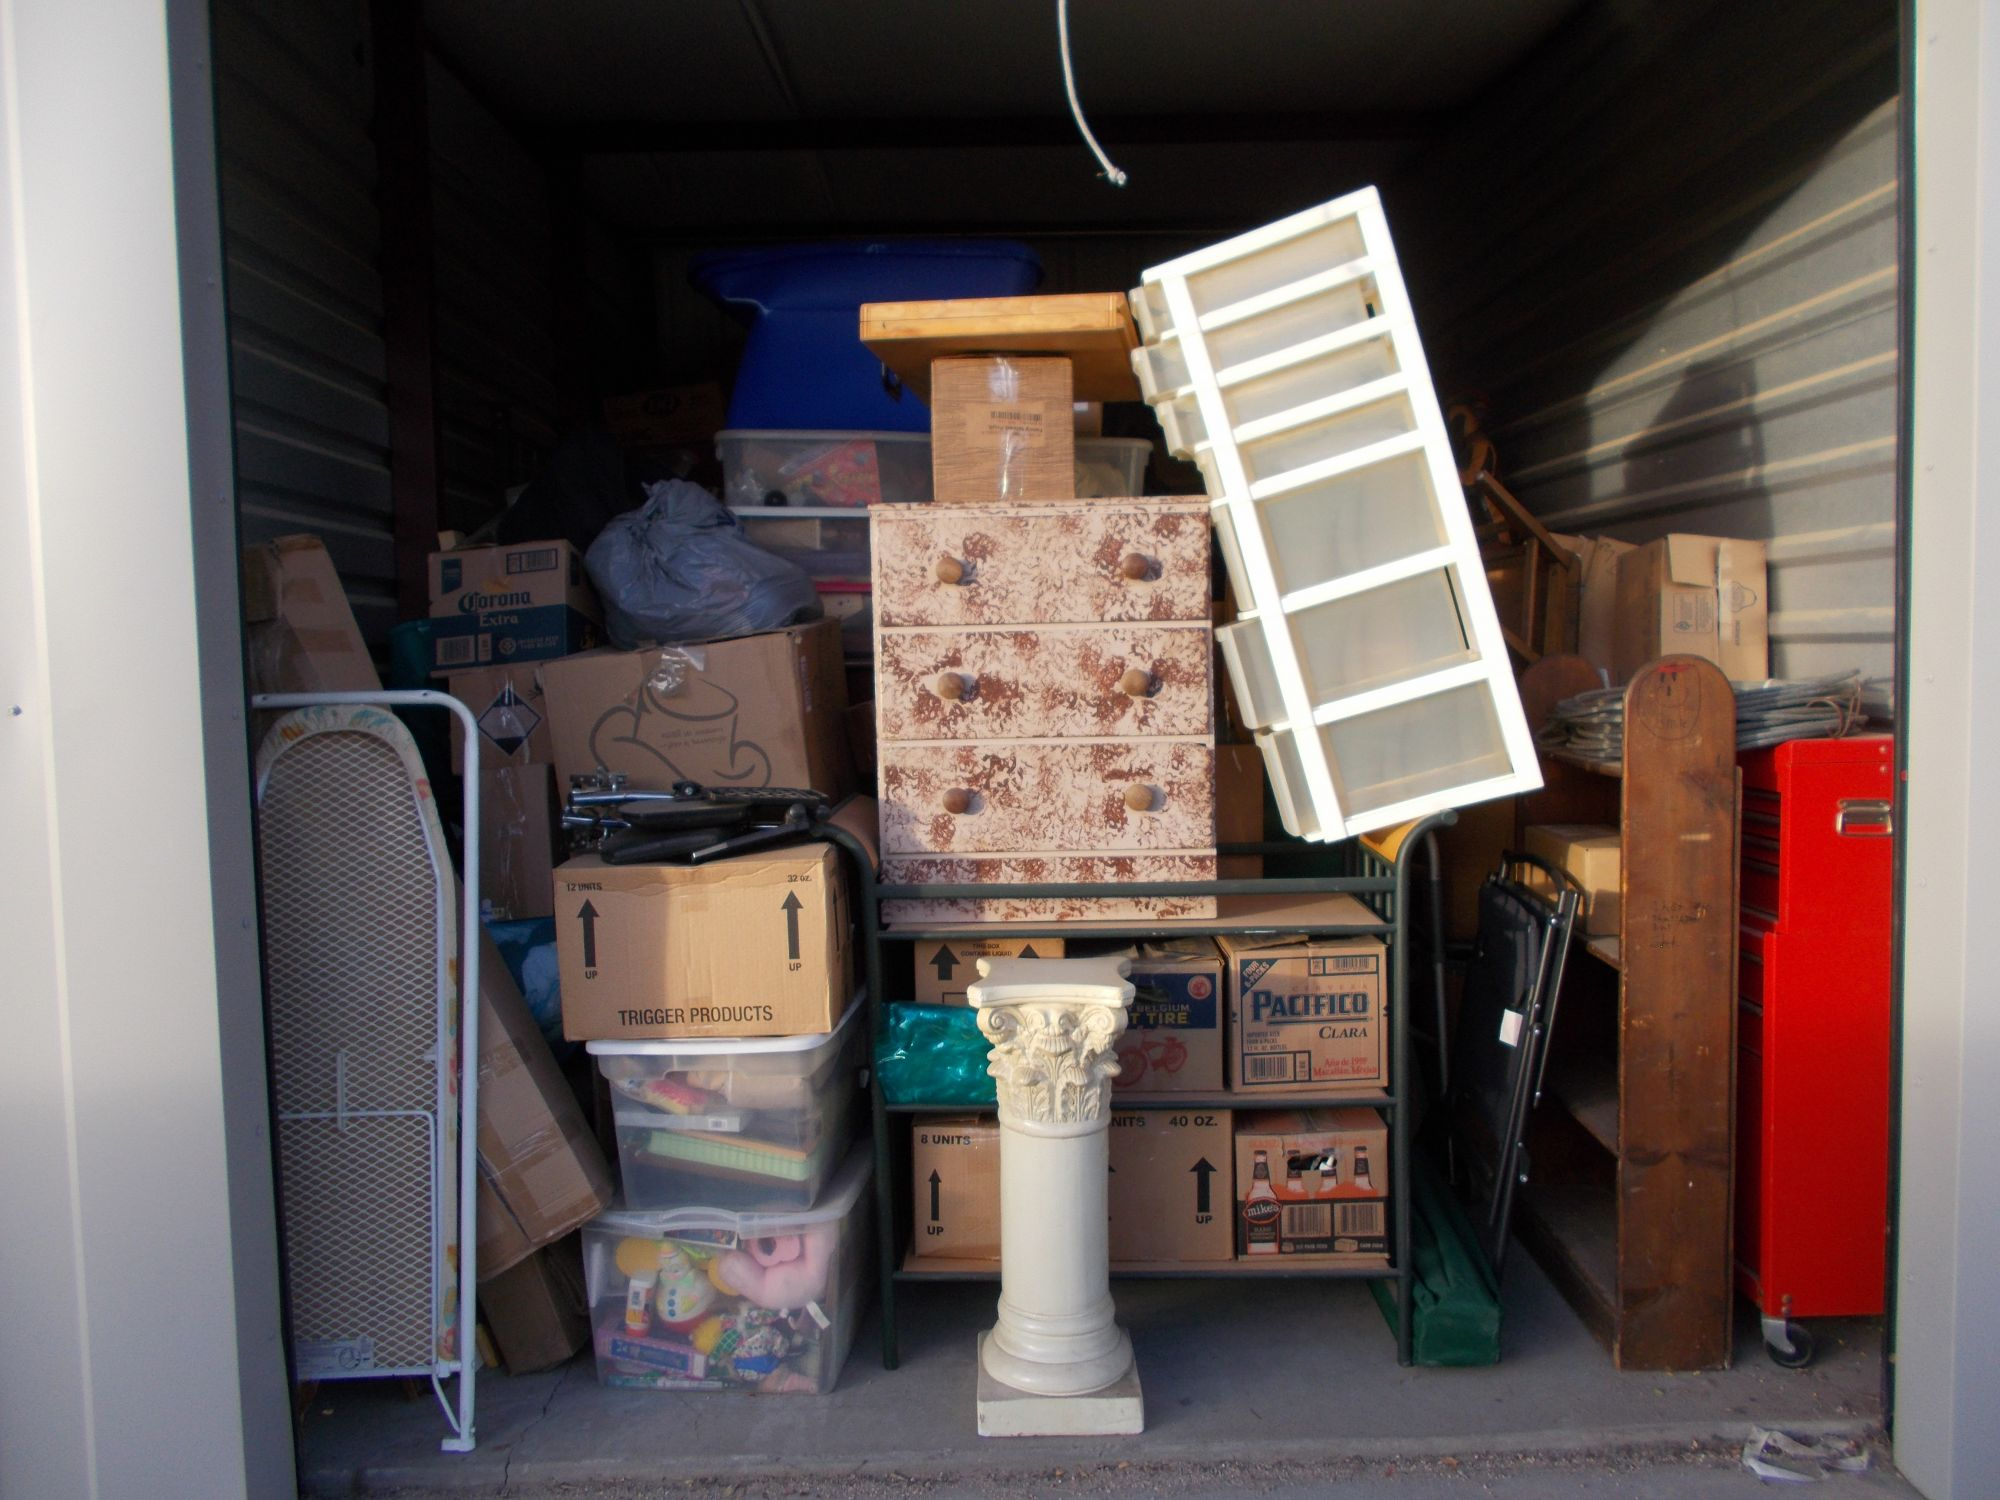 Storage Unit Auction 546969 Colorado Springs Co. SaveEnlarge & Storage Unit Auctions Colorado Springs - Listitdallas